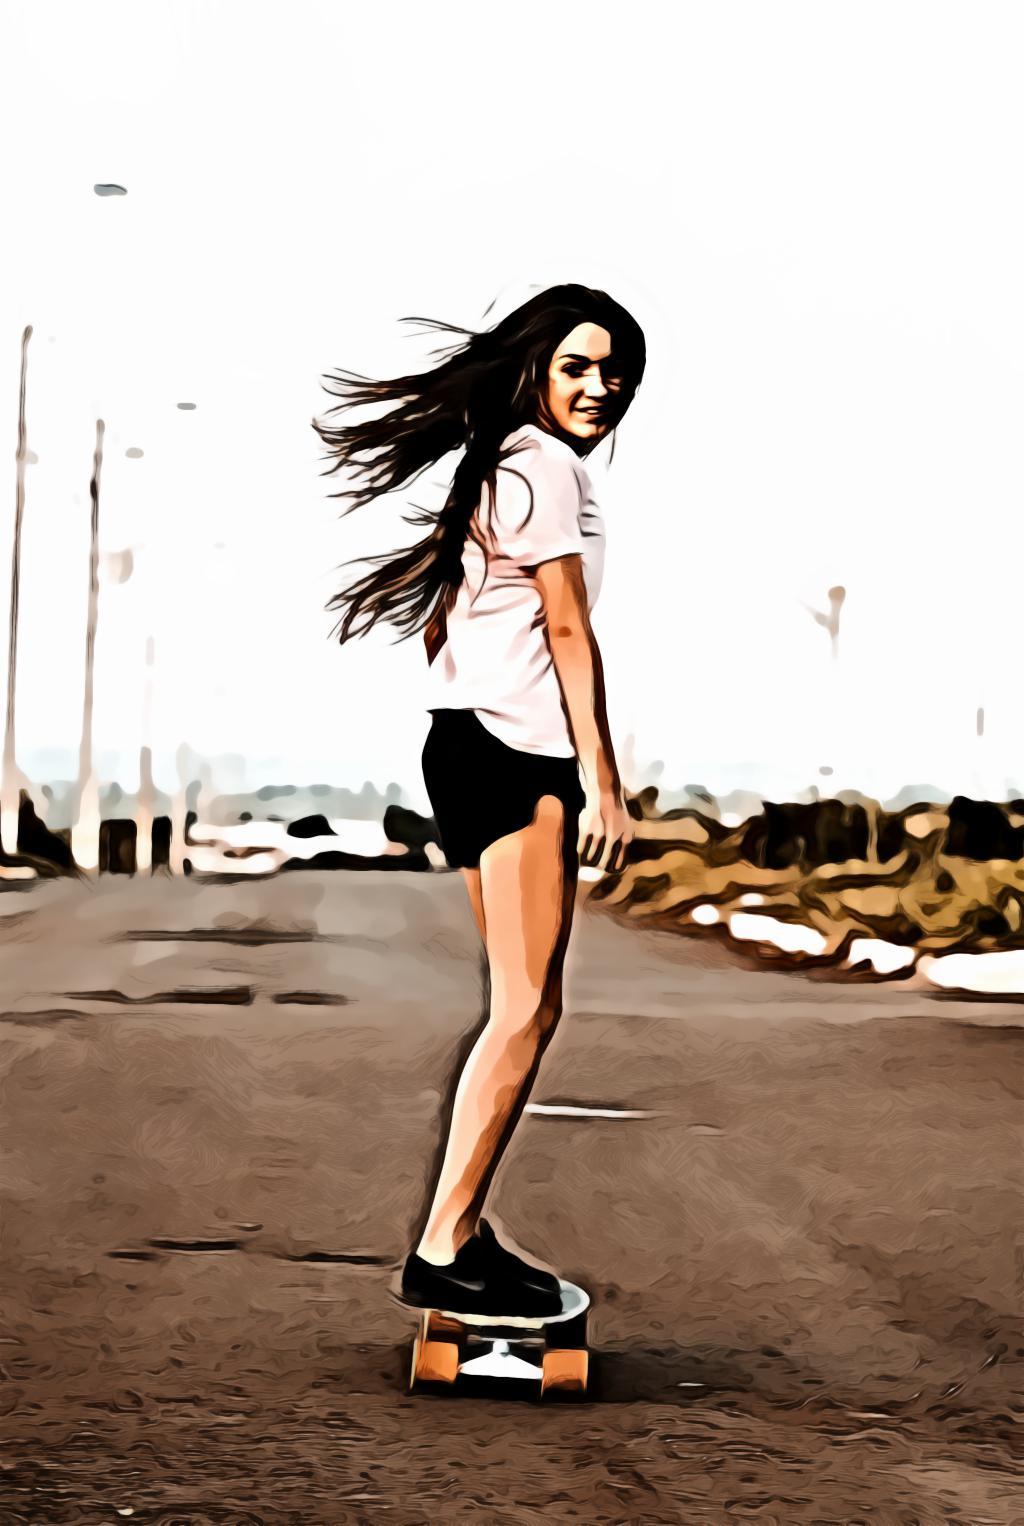 Woman riding skateboard at the road